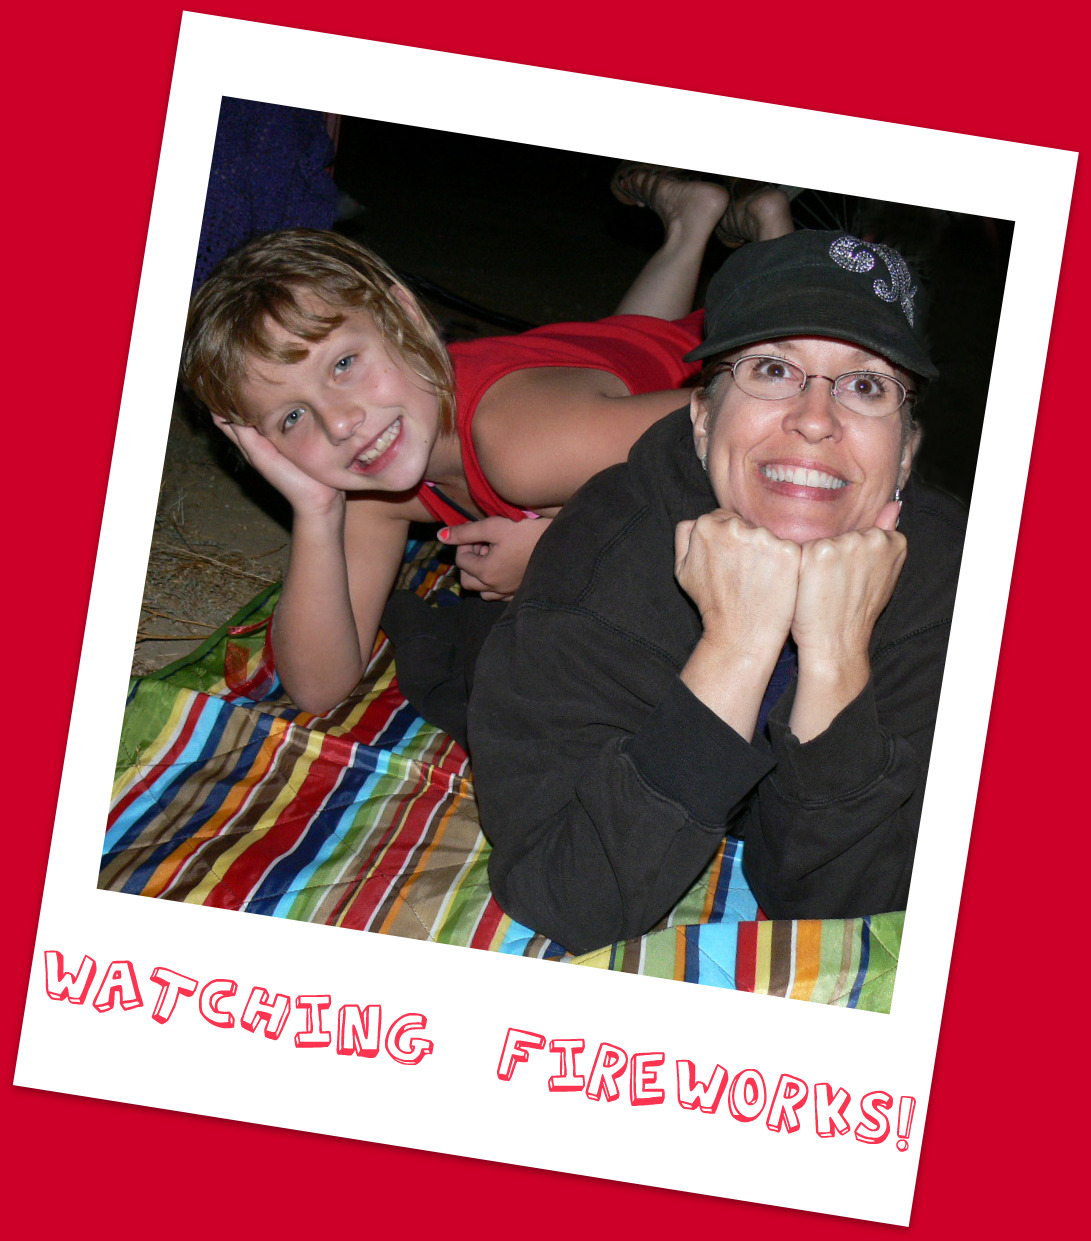 Gracie and April enjoying the Mt. Rubidoux fireworks show!